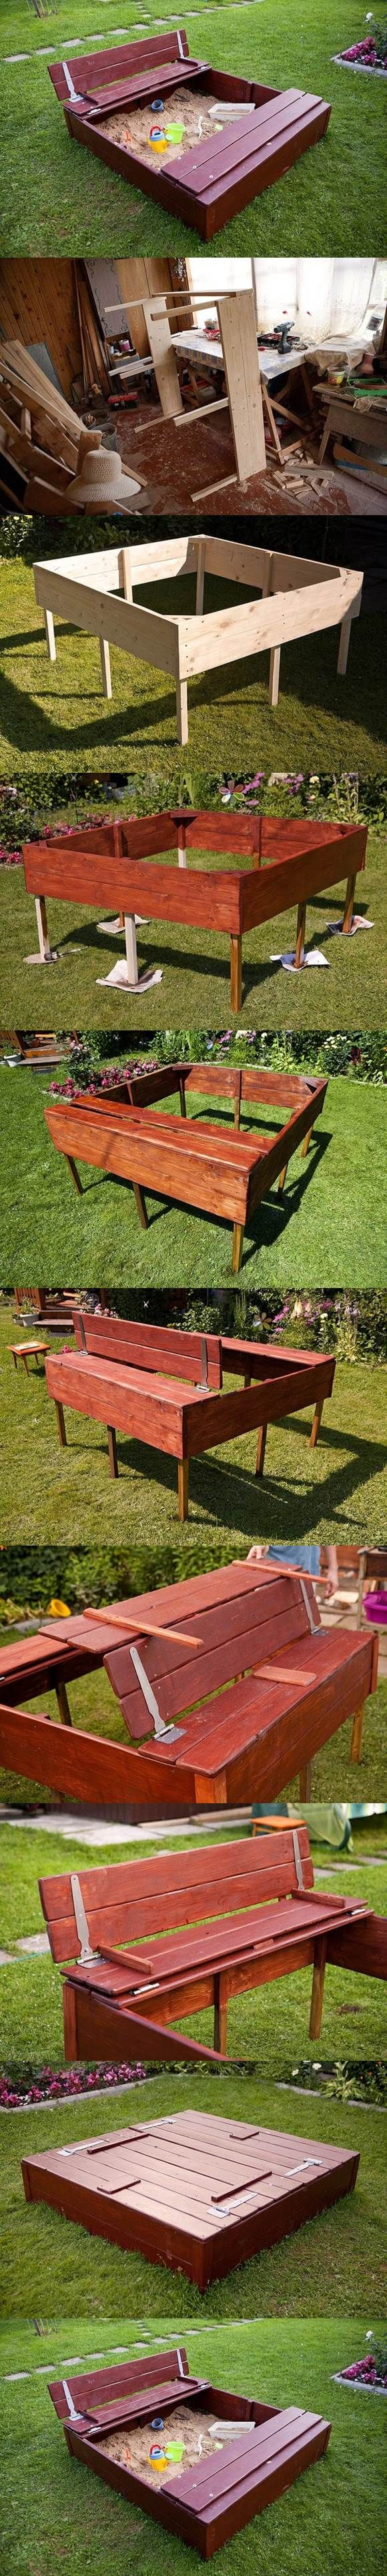 DIY Nice Sandbox for Kids   iCreativeIdeas.com LIKE Us on Facebook ==> https://www.facebook.com/icreativeideas